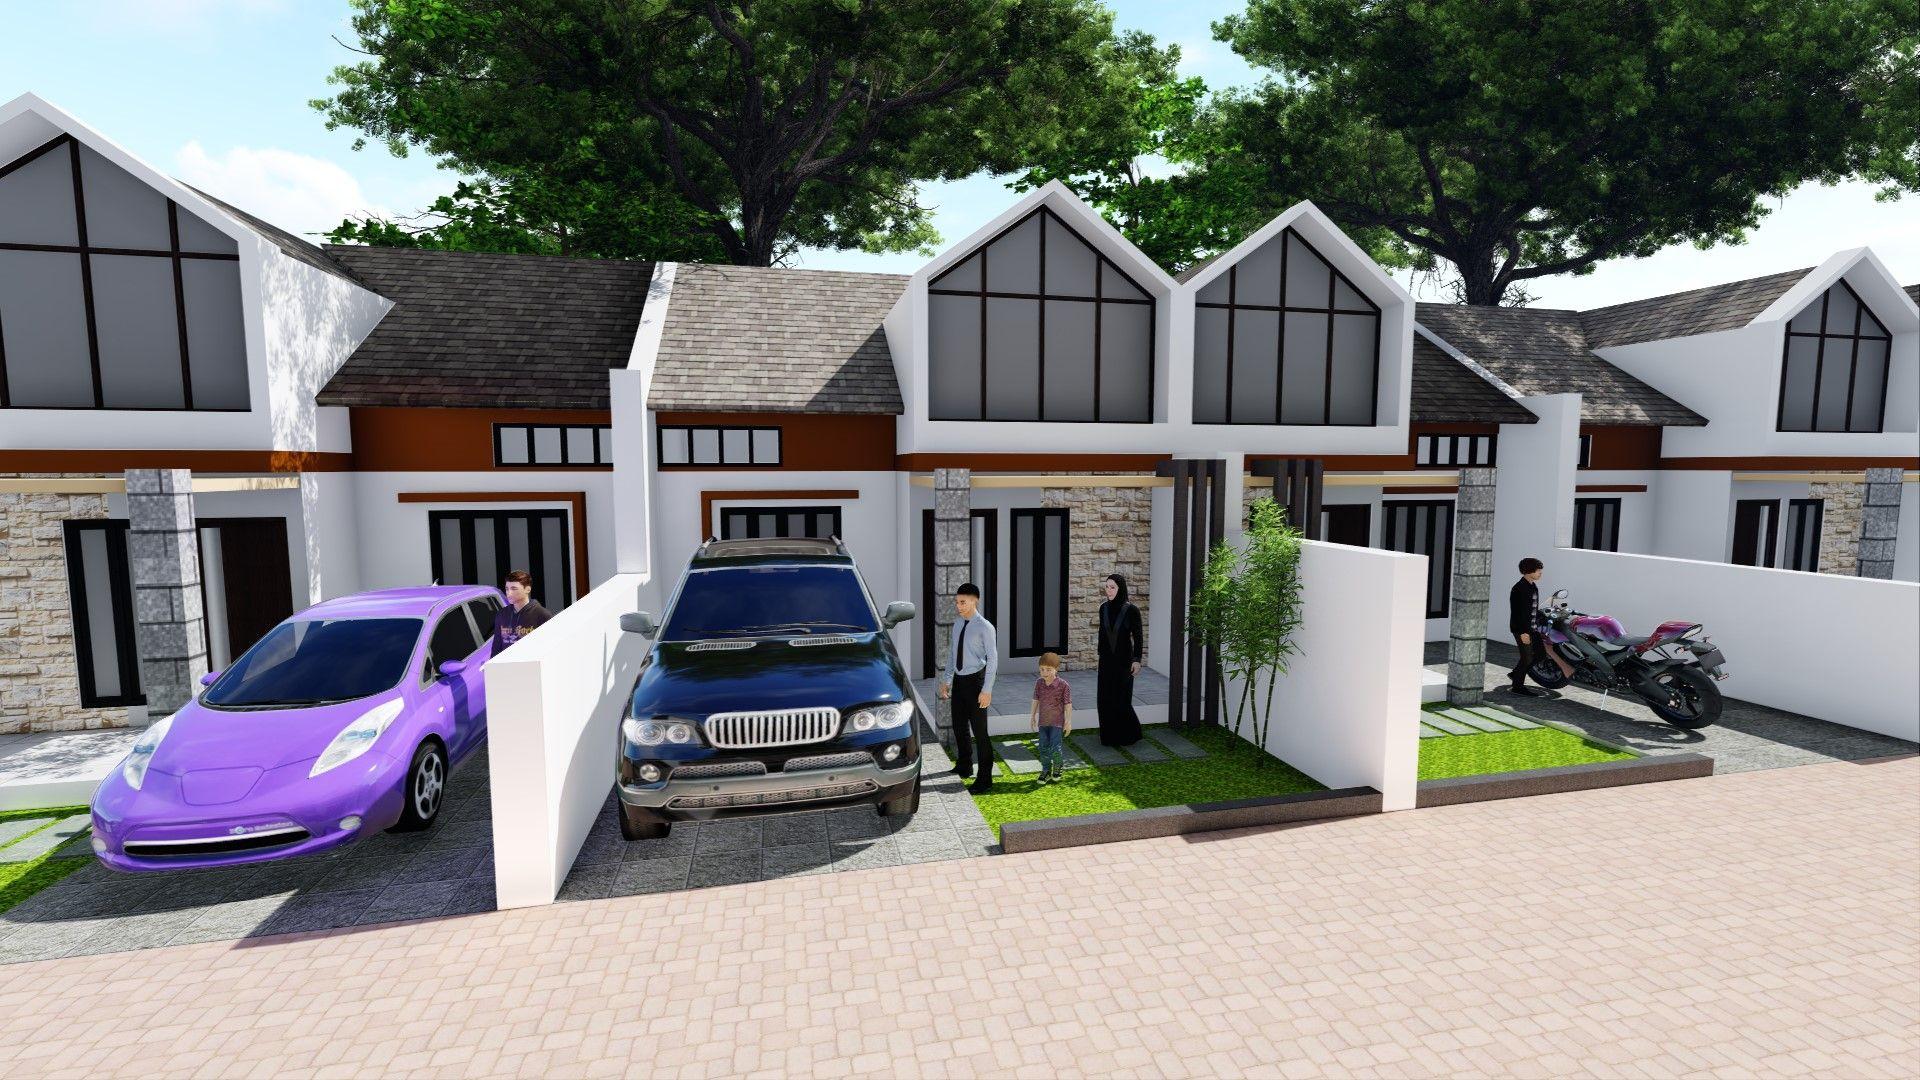 Tipe 36 De Royal Eden House Styles Outdoor Structures House